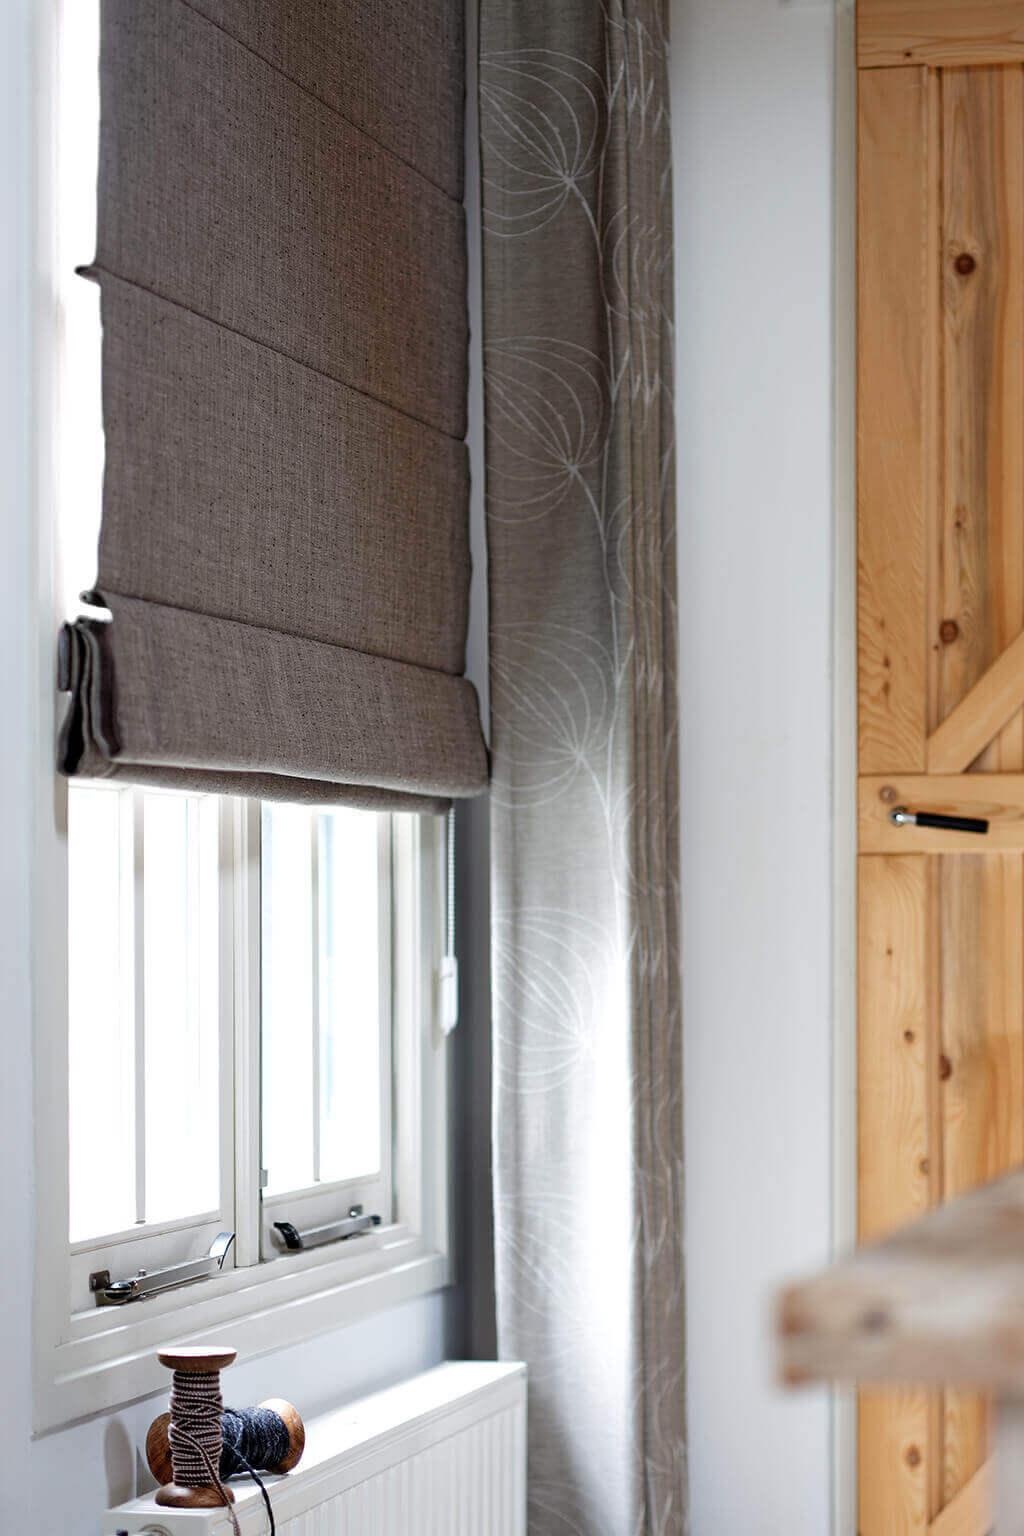 rollo und gardine kombinieren gallery of wohnen gardinen rollos rollos plissees with rollo und. Black Bedroom Furniture Sets. Home Design Ideas